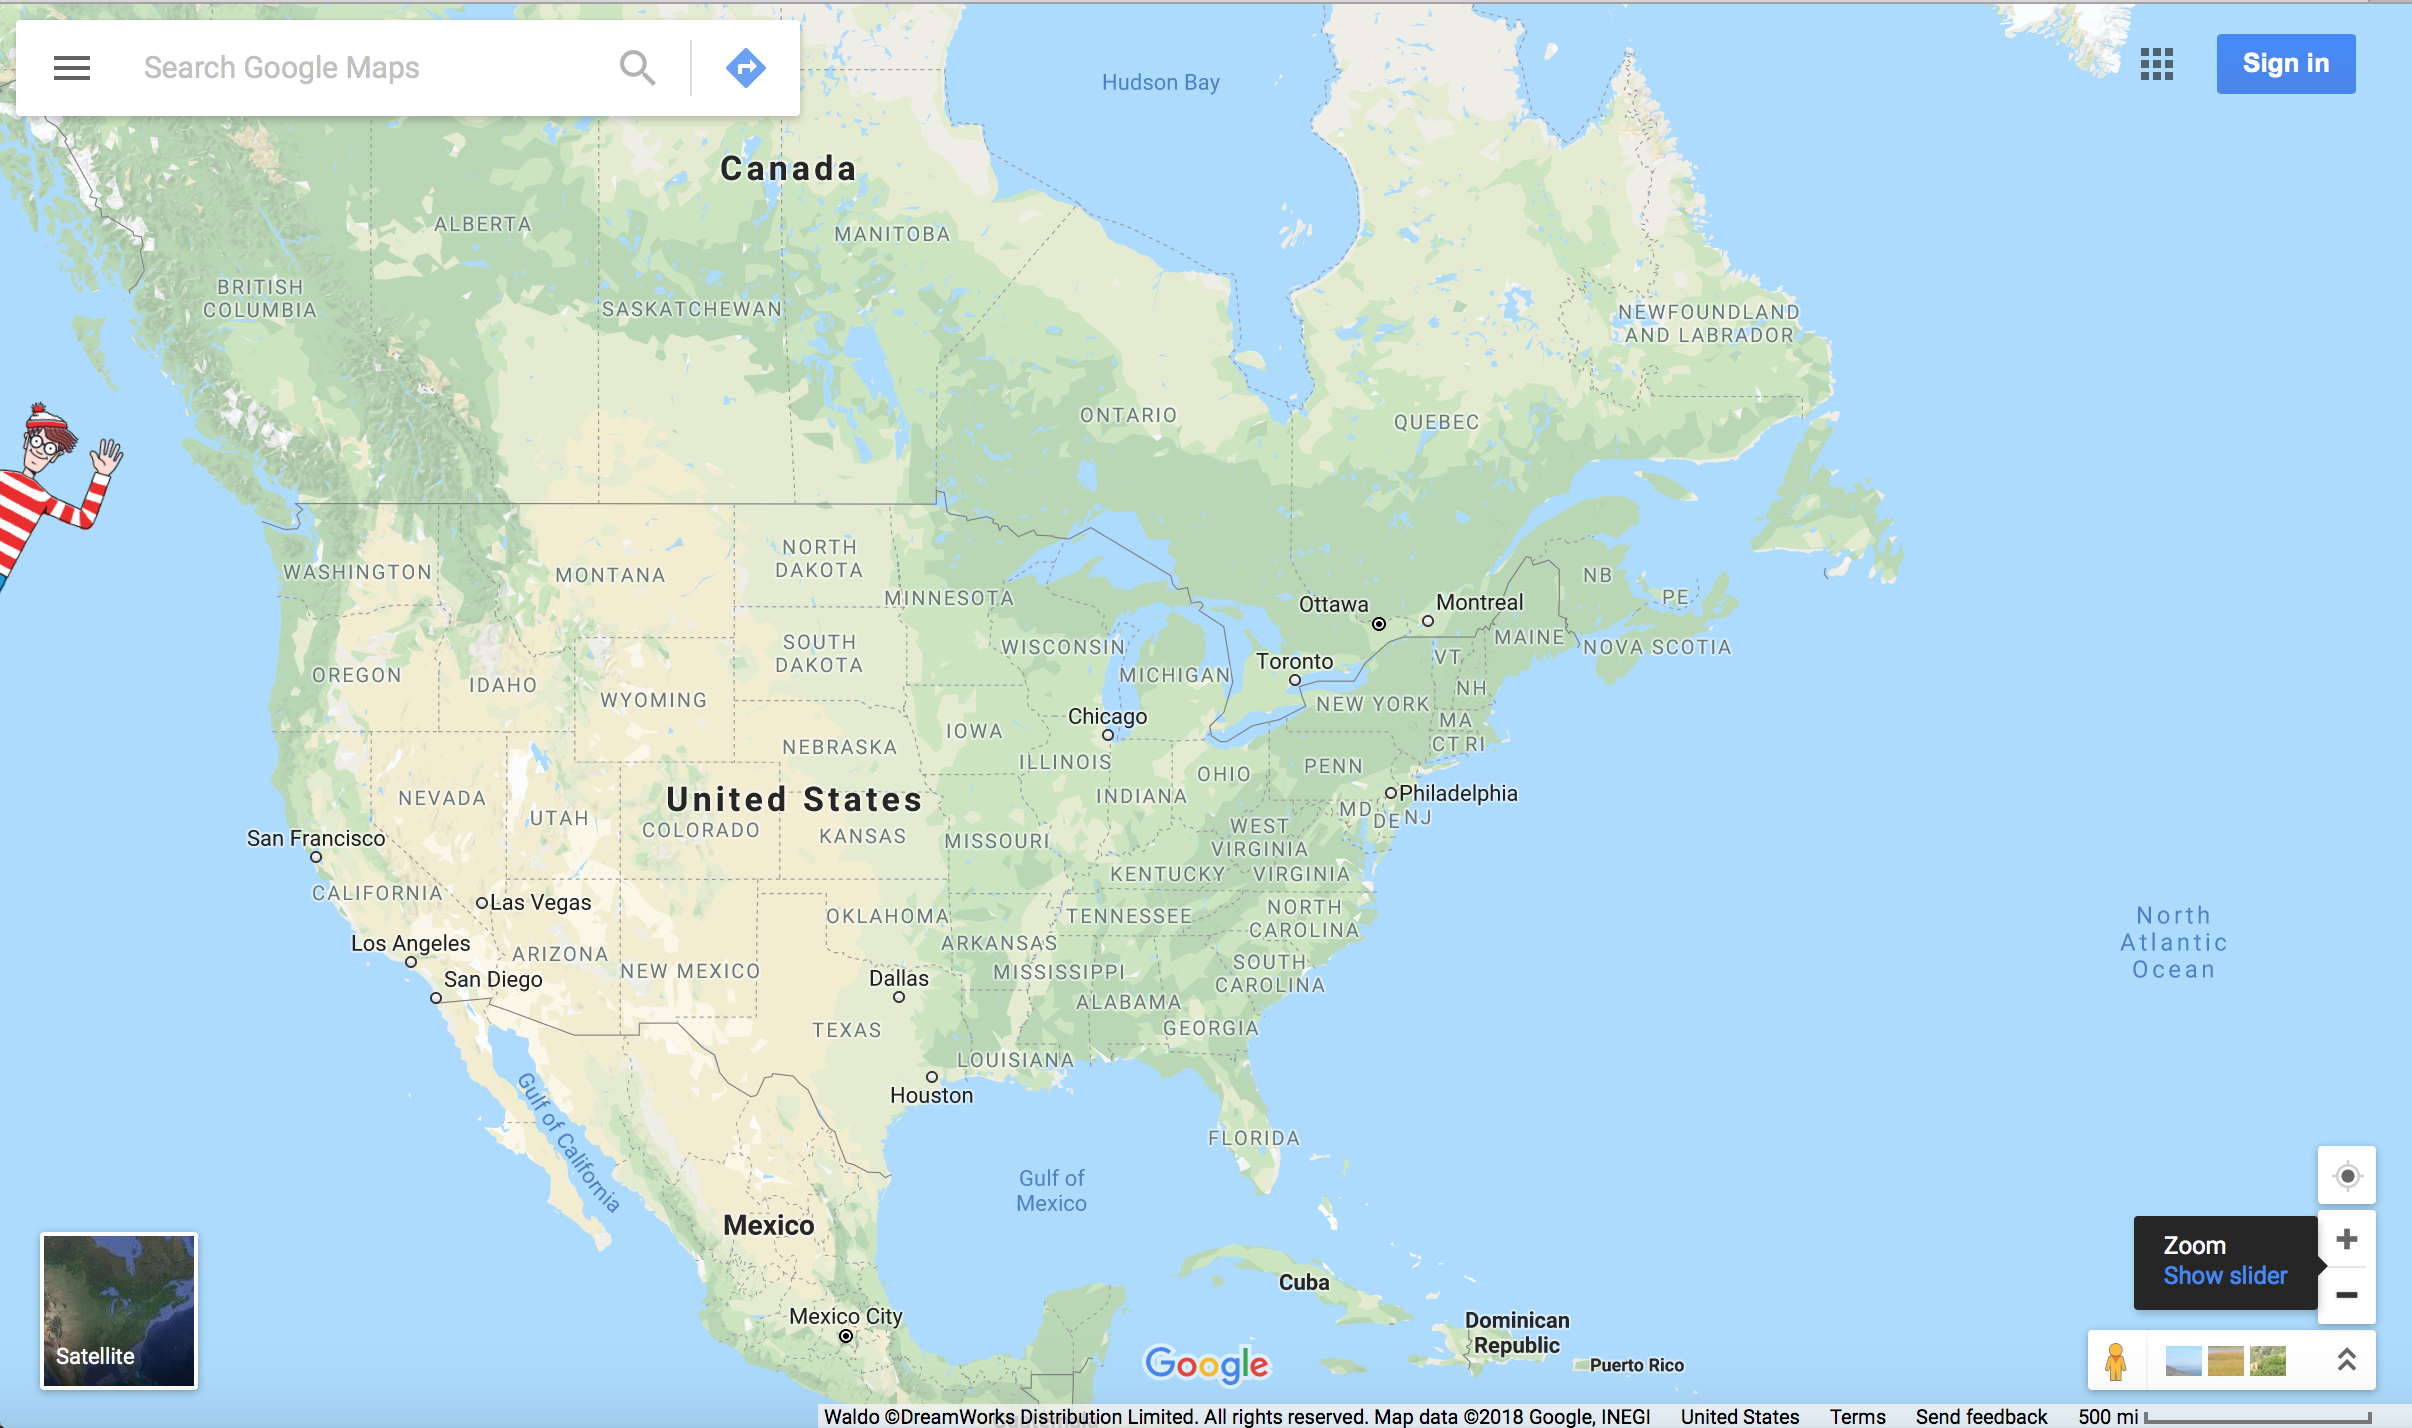 Where's Waldo  on Google Maps